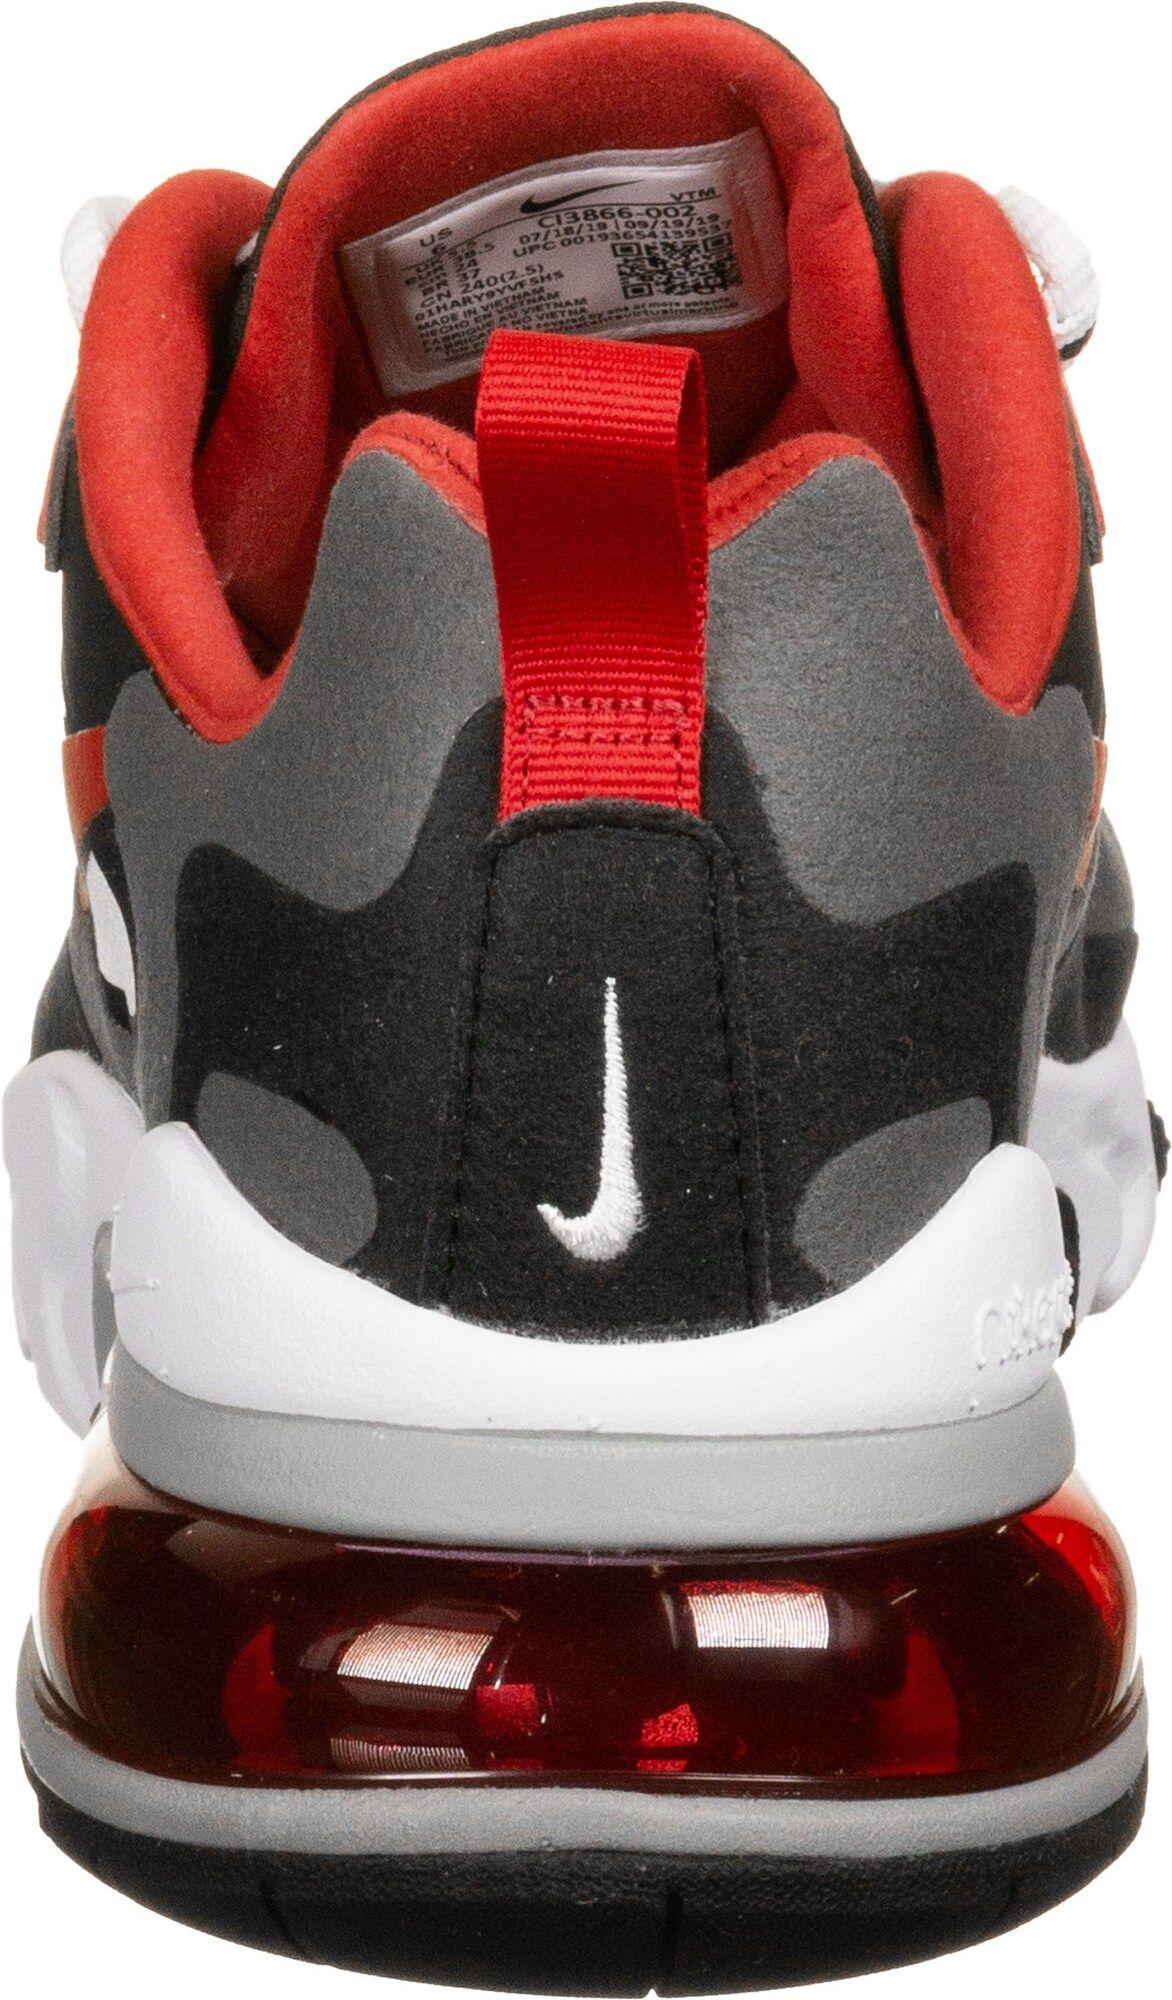 Nike Sportswear Schuhe Air Max 270 React Herren Rot Grosse 42 5 Shoes Unisex Adidas Eur In 2020 Nike Sportswear Nike Und Schuhe